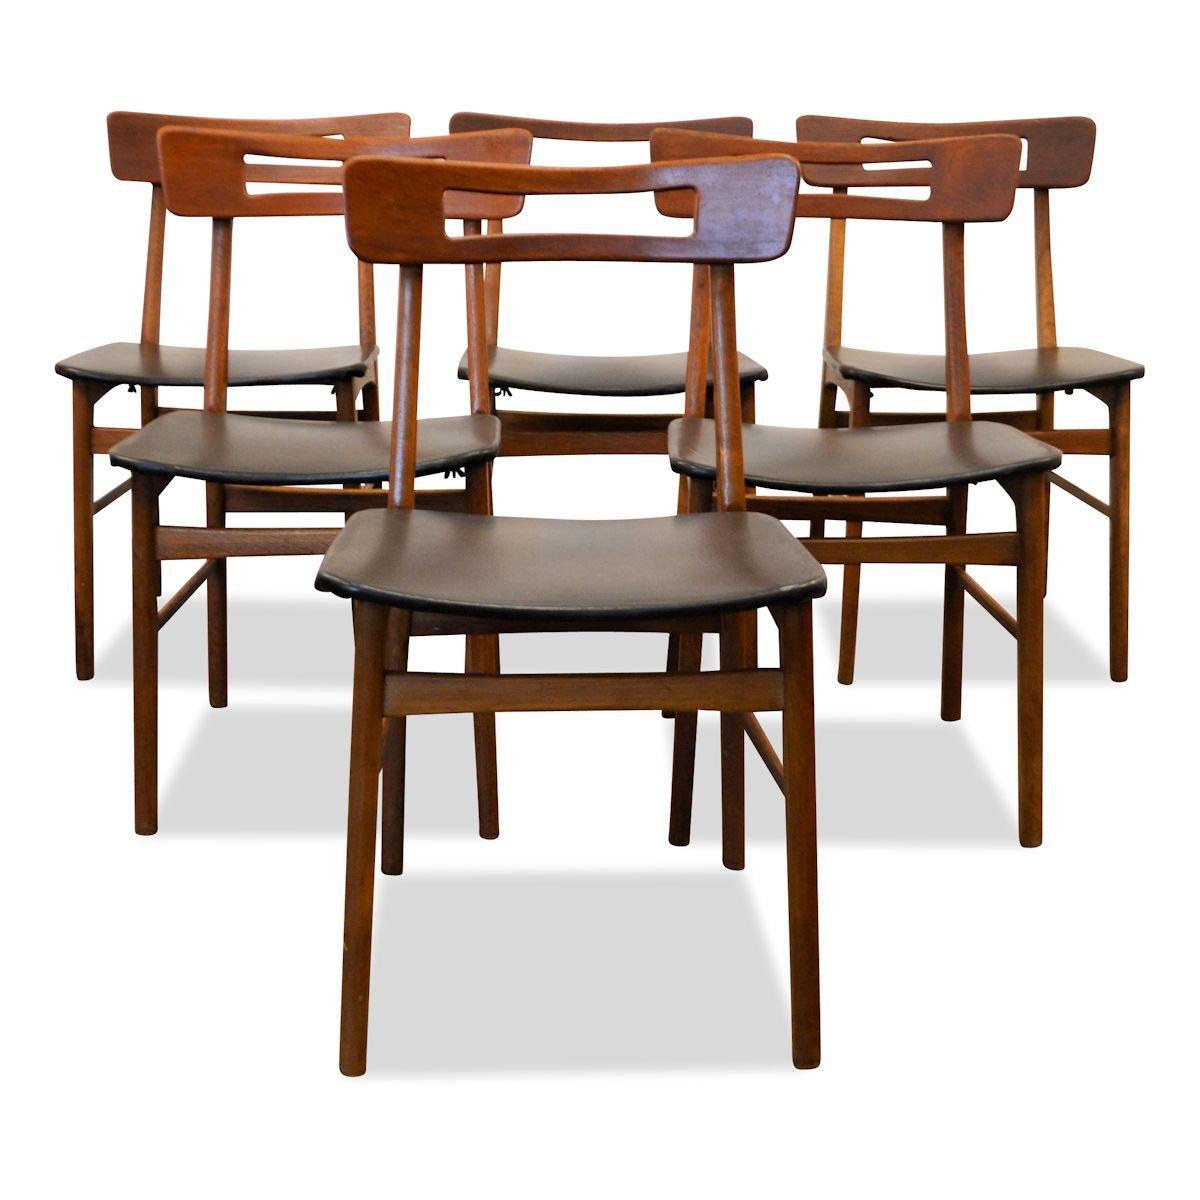 Danish Modern Dining Chairs: Vintage Teak Danish Modern Dining Chairs